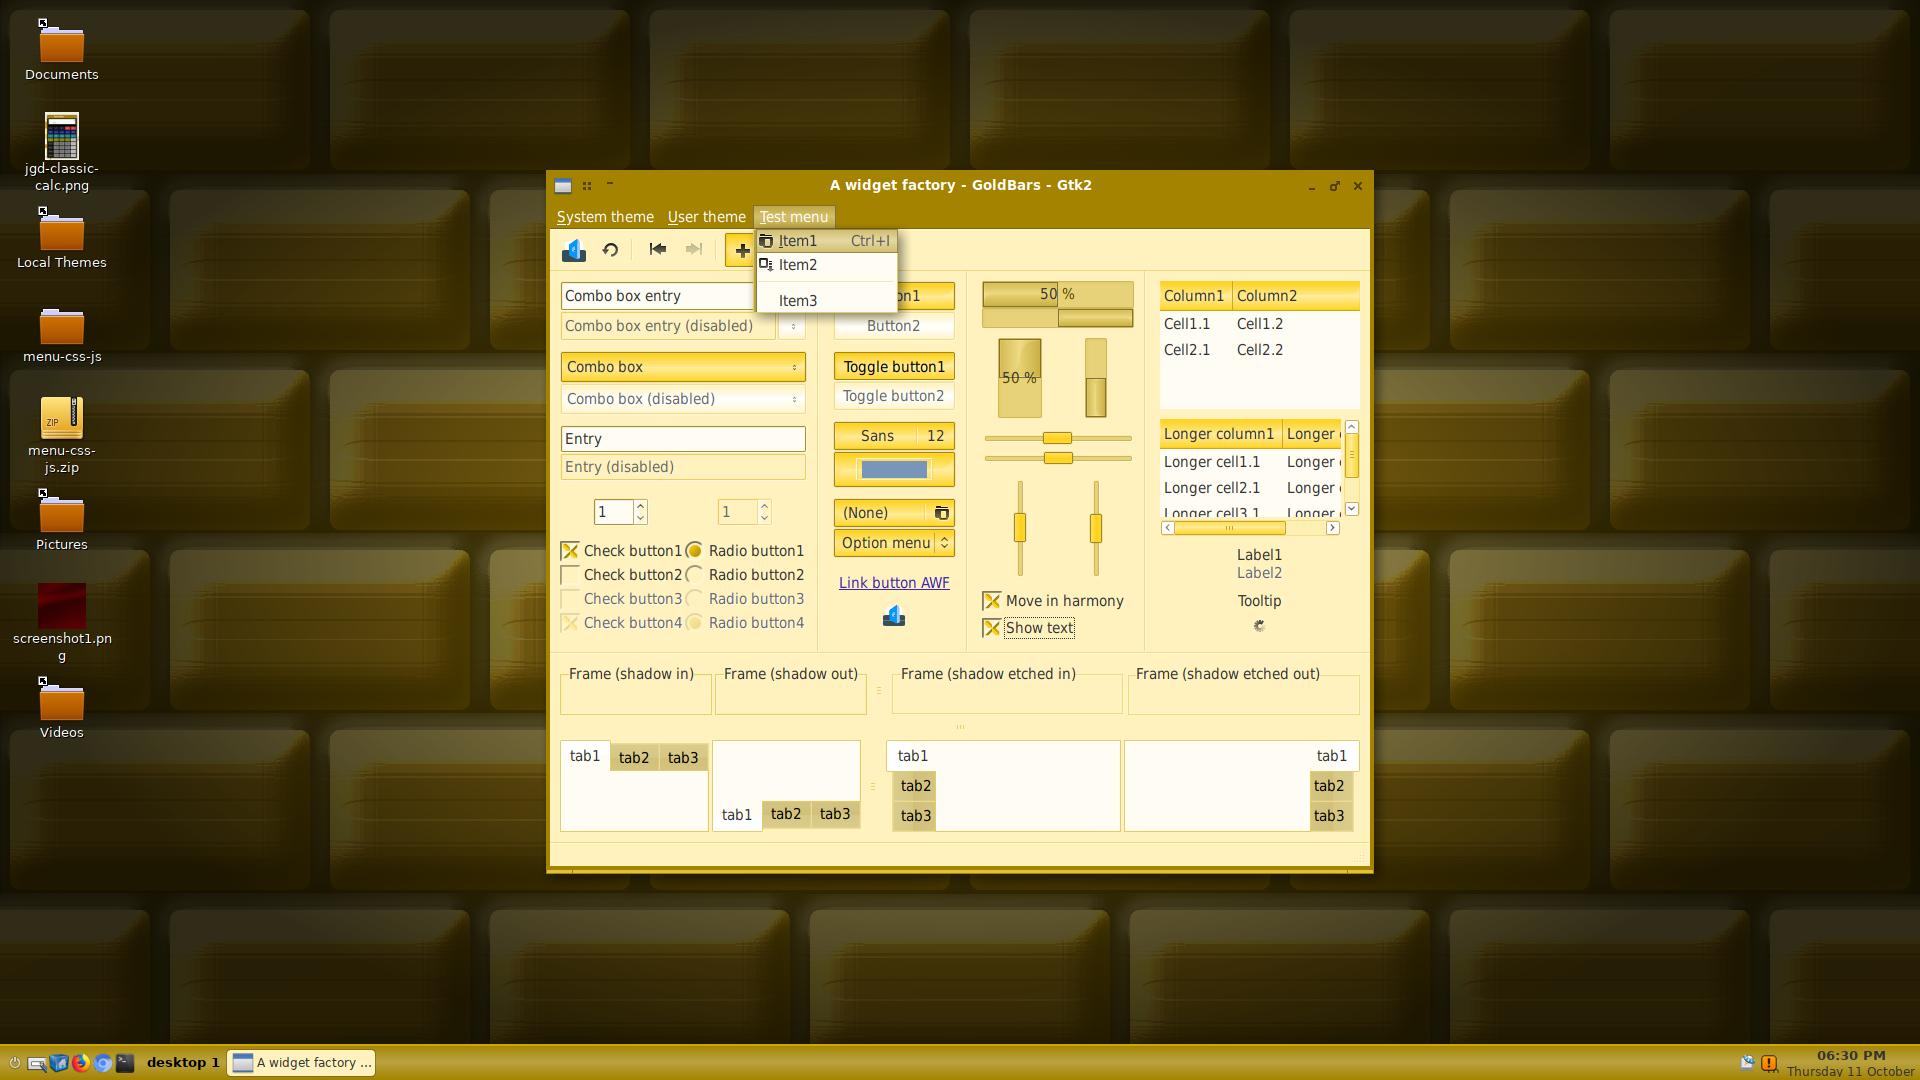 GoldBars - Jason G  Designs